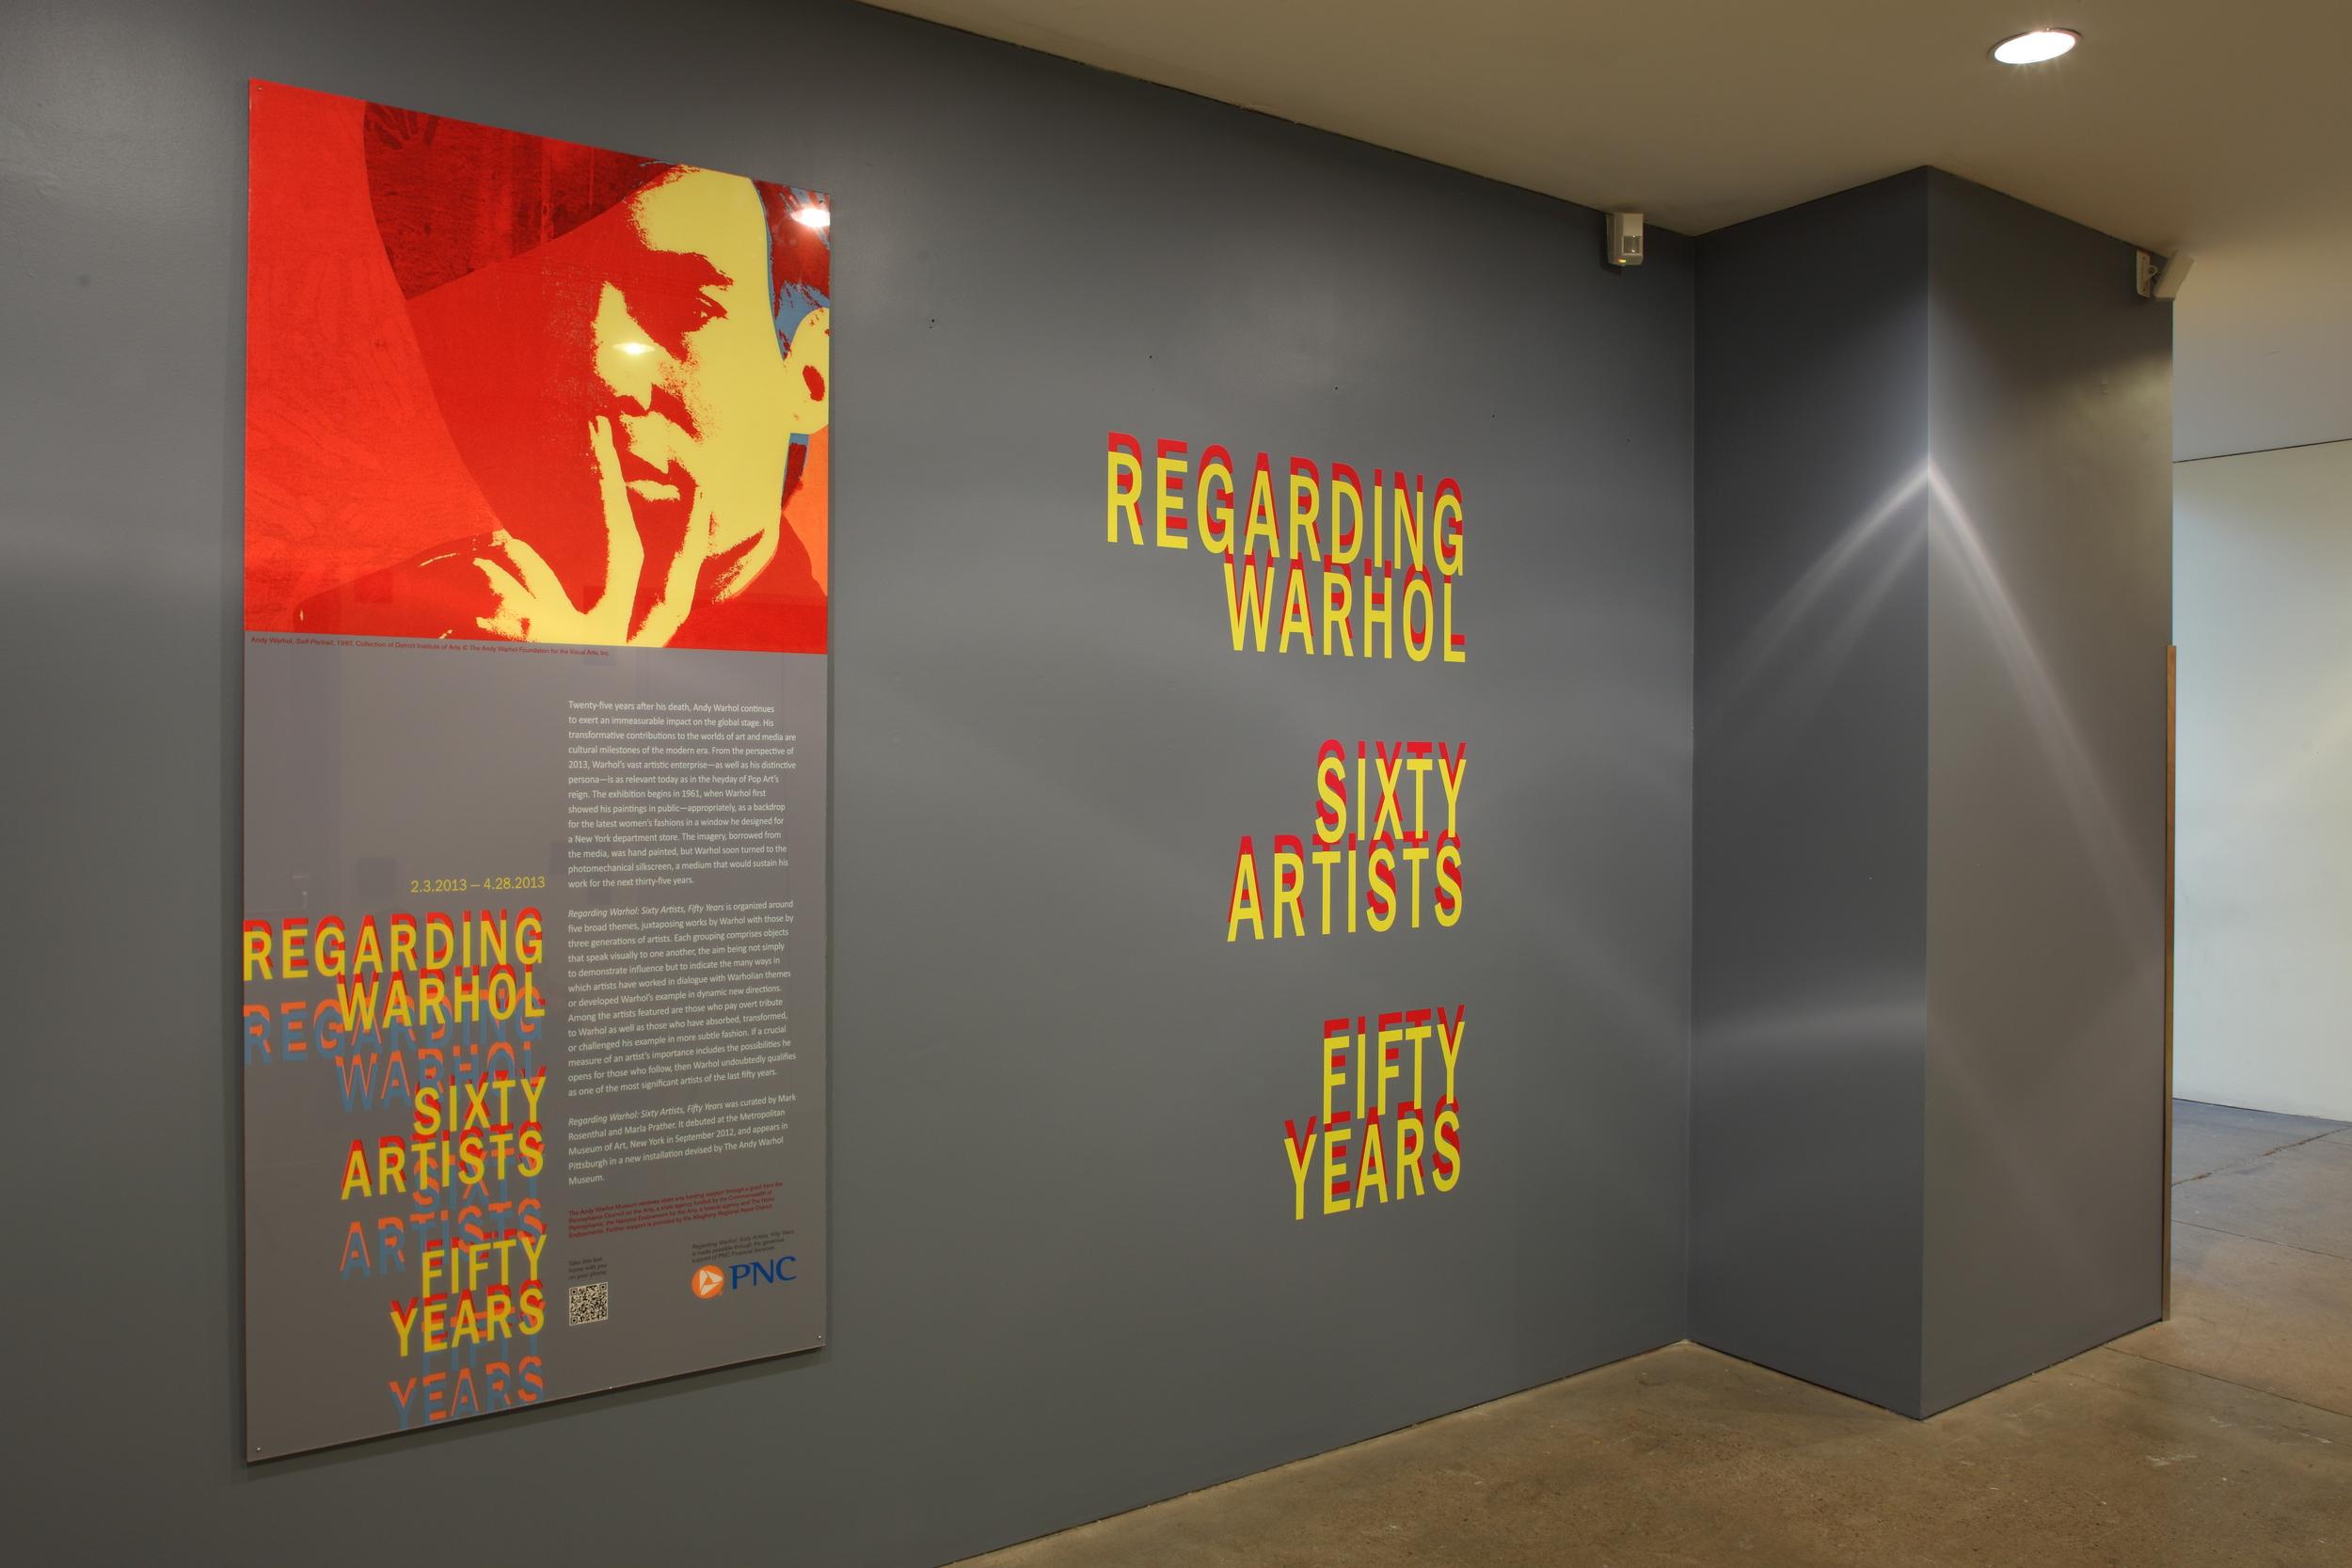 Regarding Warhol at The Andy Warhol Museum, 2013 G701 0001.JPG